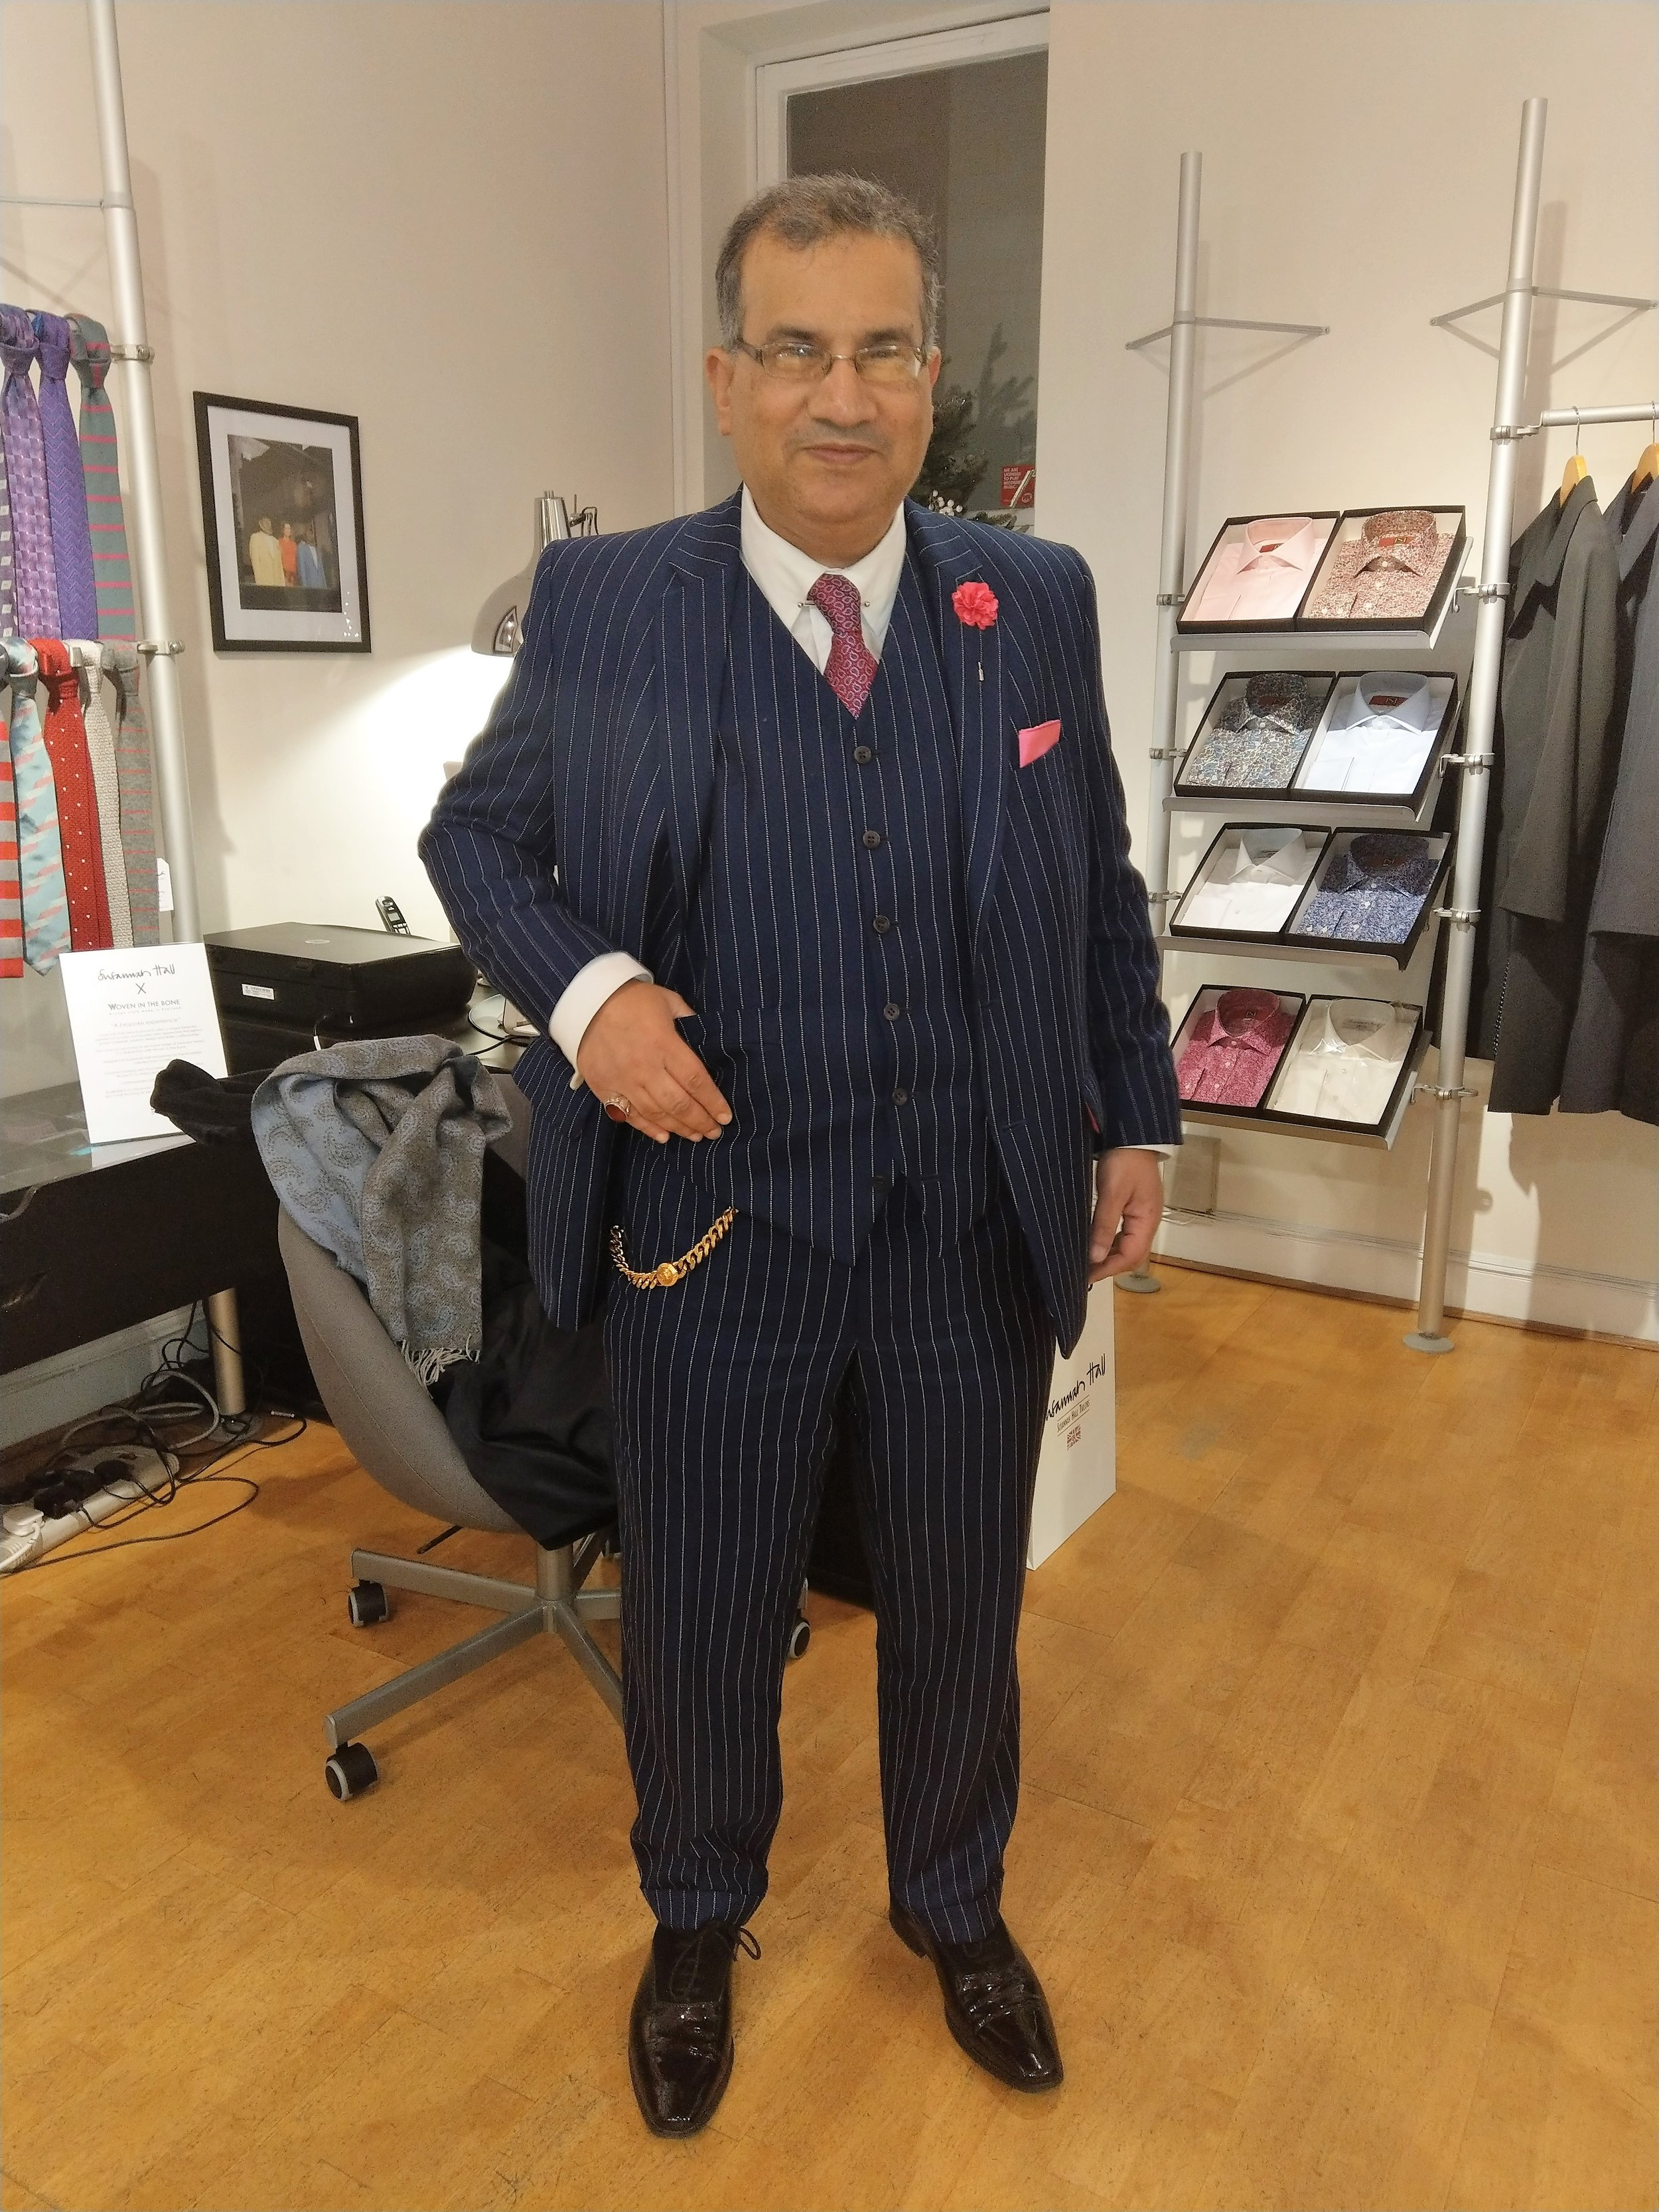 susannah-hall-tailor-dugdale-chalk-stripe-three-piece-suit-vintage-retro-style-made-uk-british.jpg